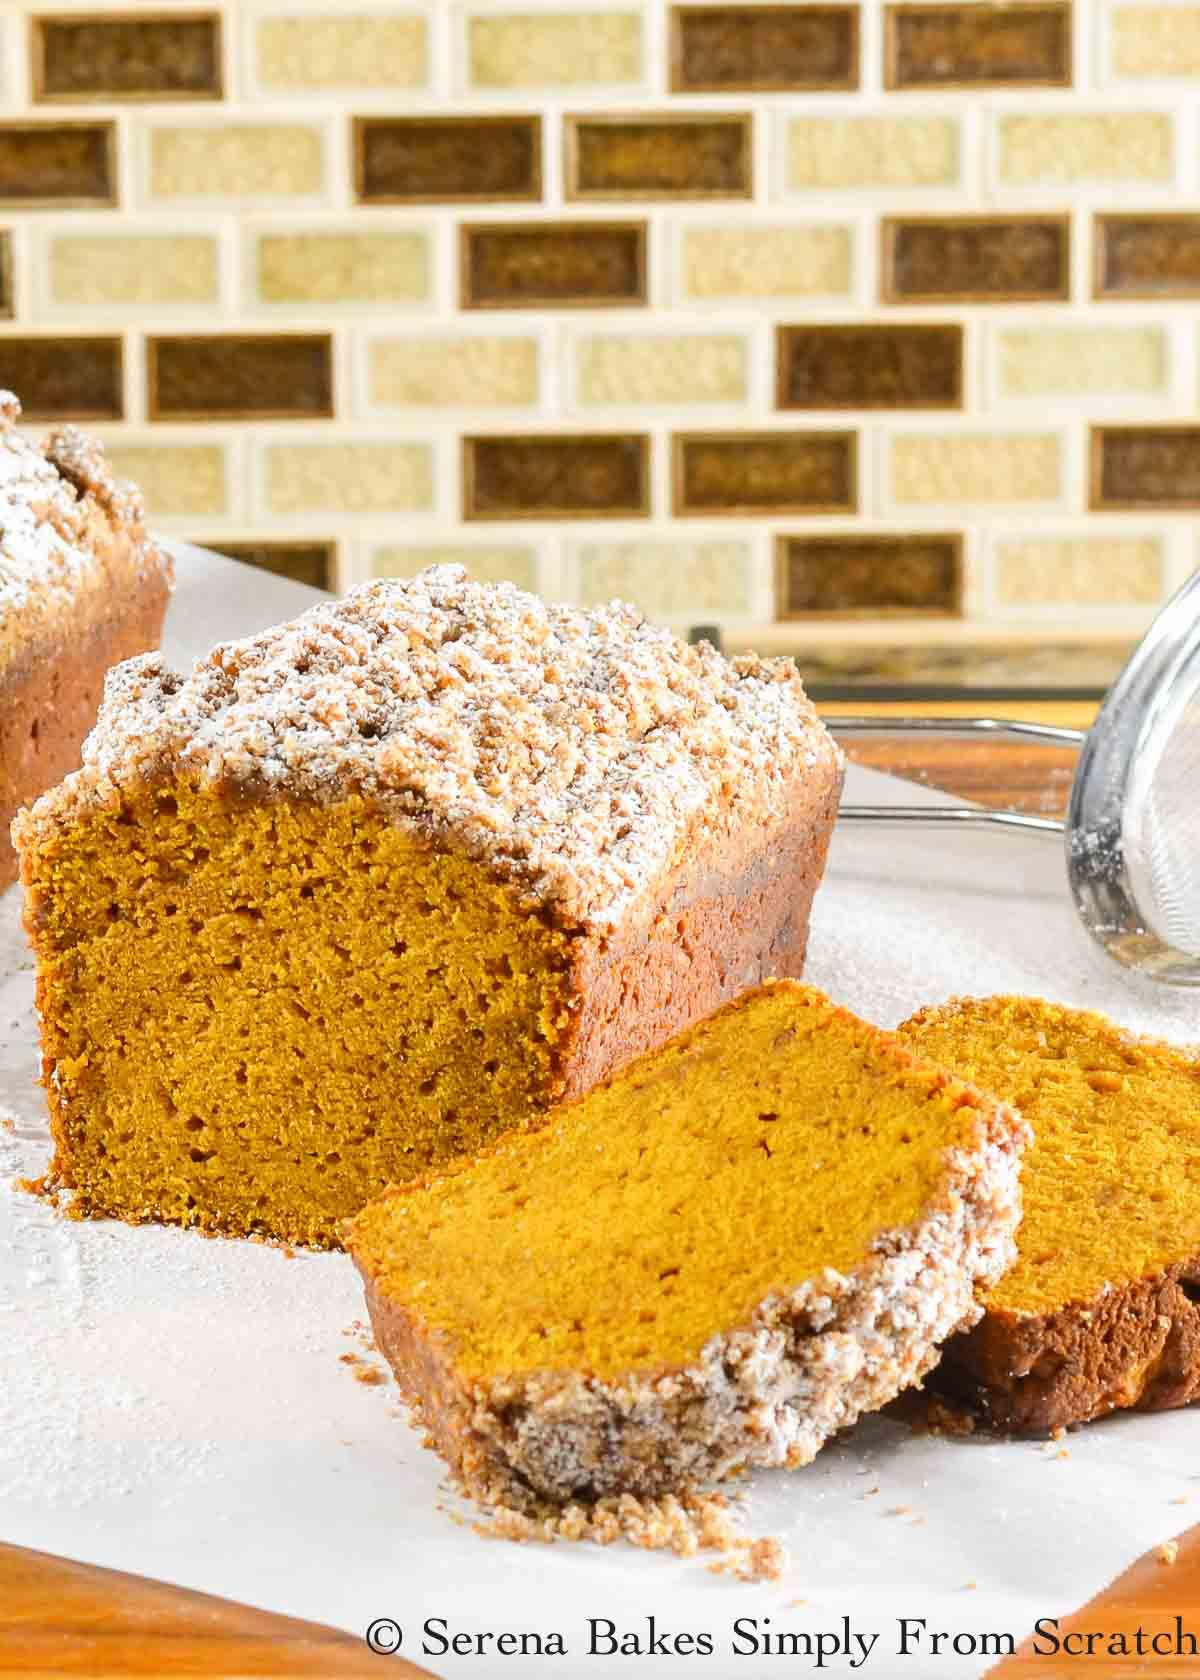 Pumpkin Bread with Streusel